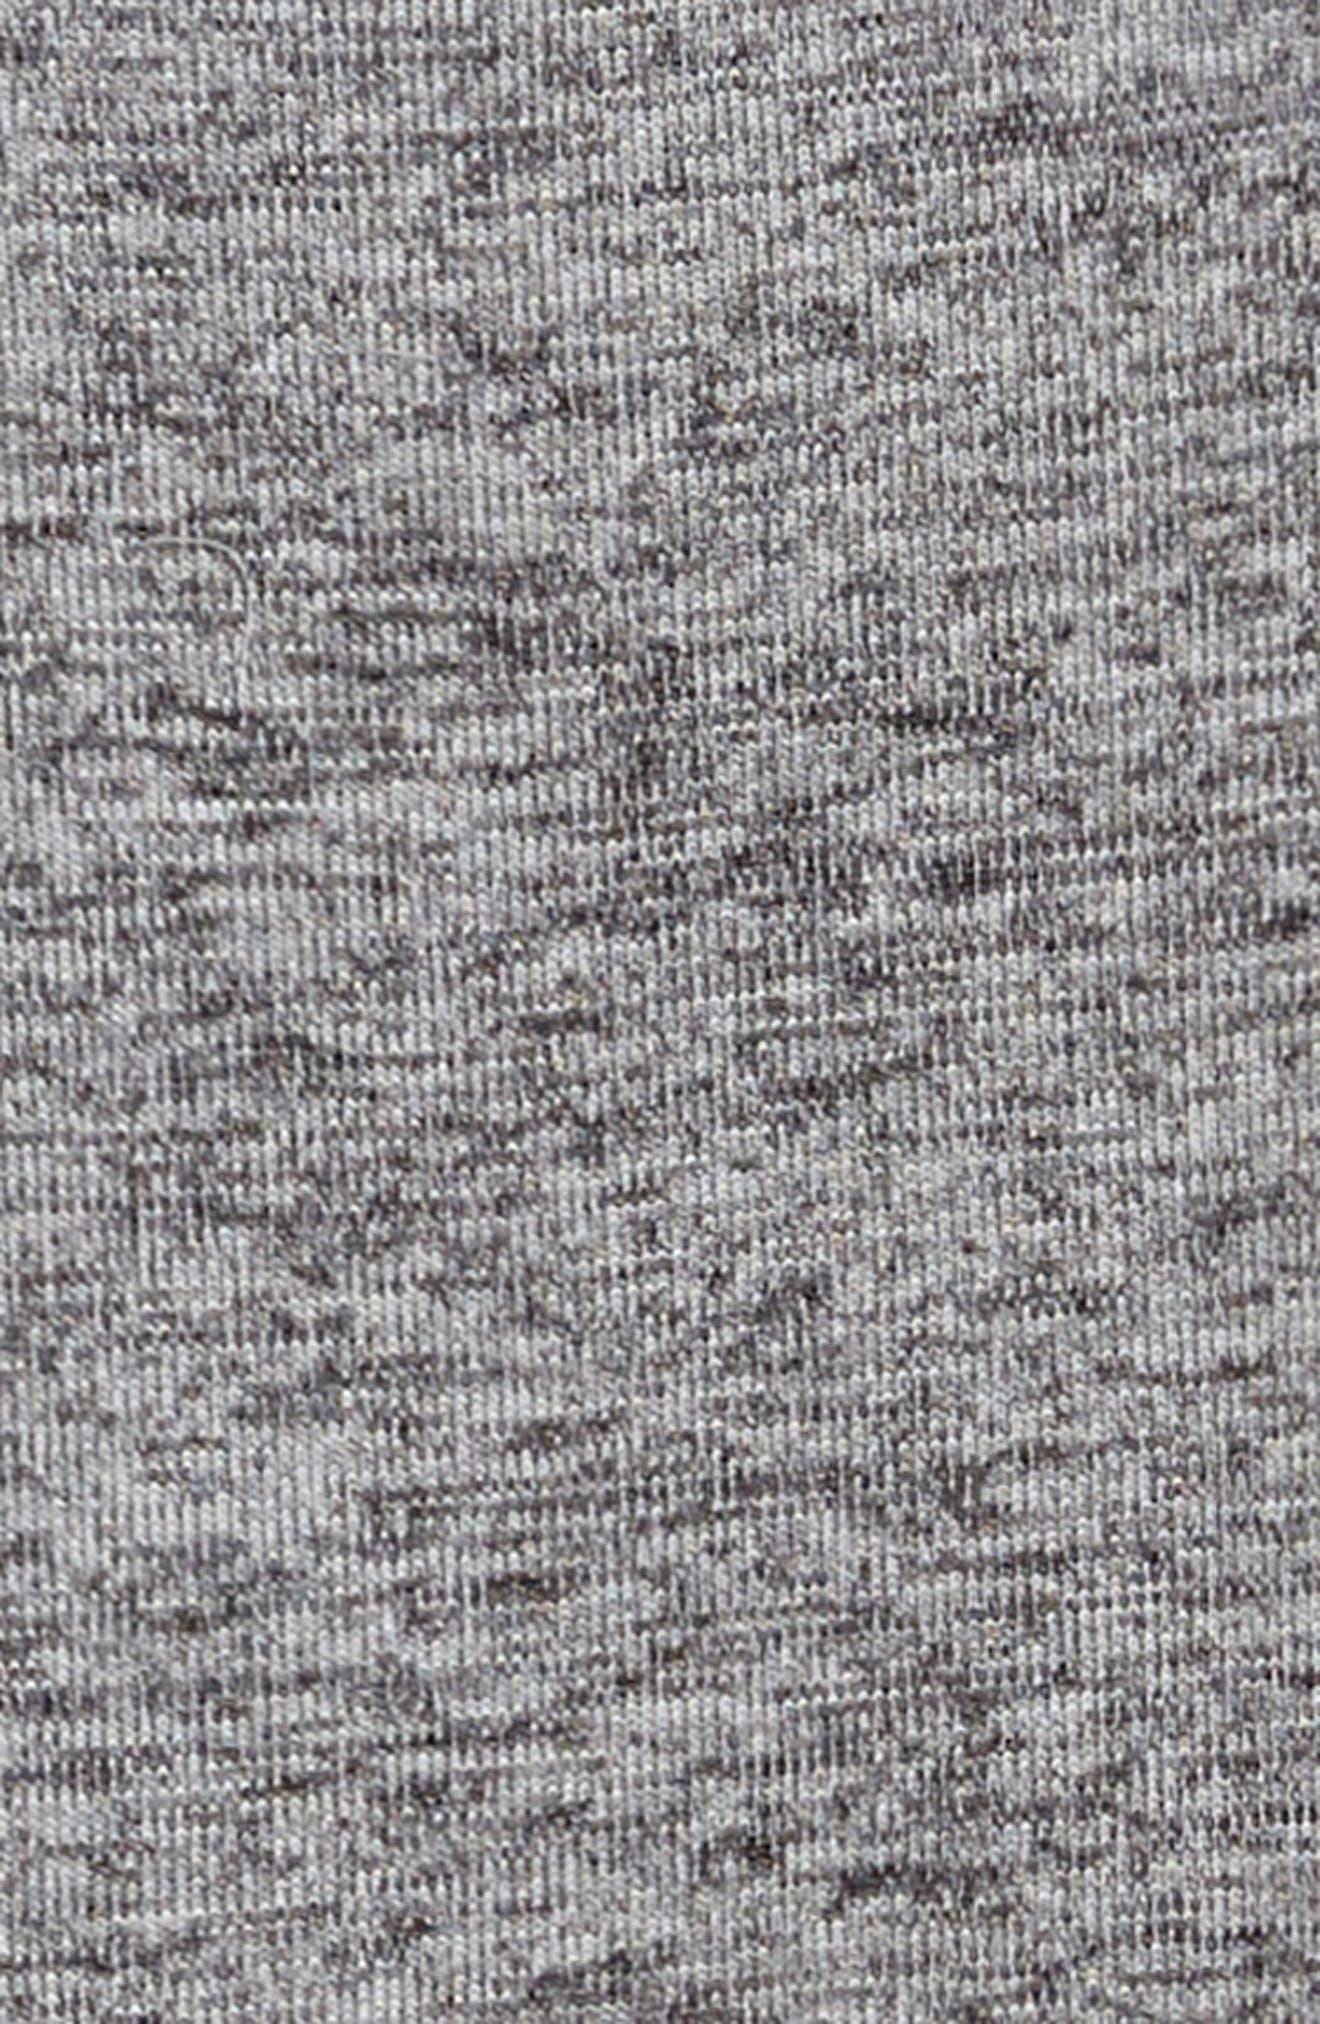 Knot Back Knit Dress,                             Alternate thumbnail 3, color,                             Grey Medium Heather